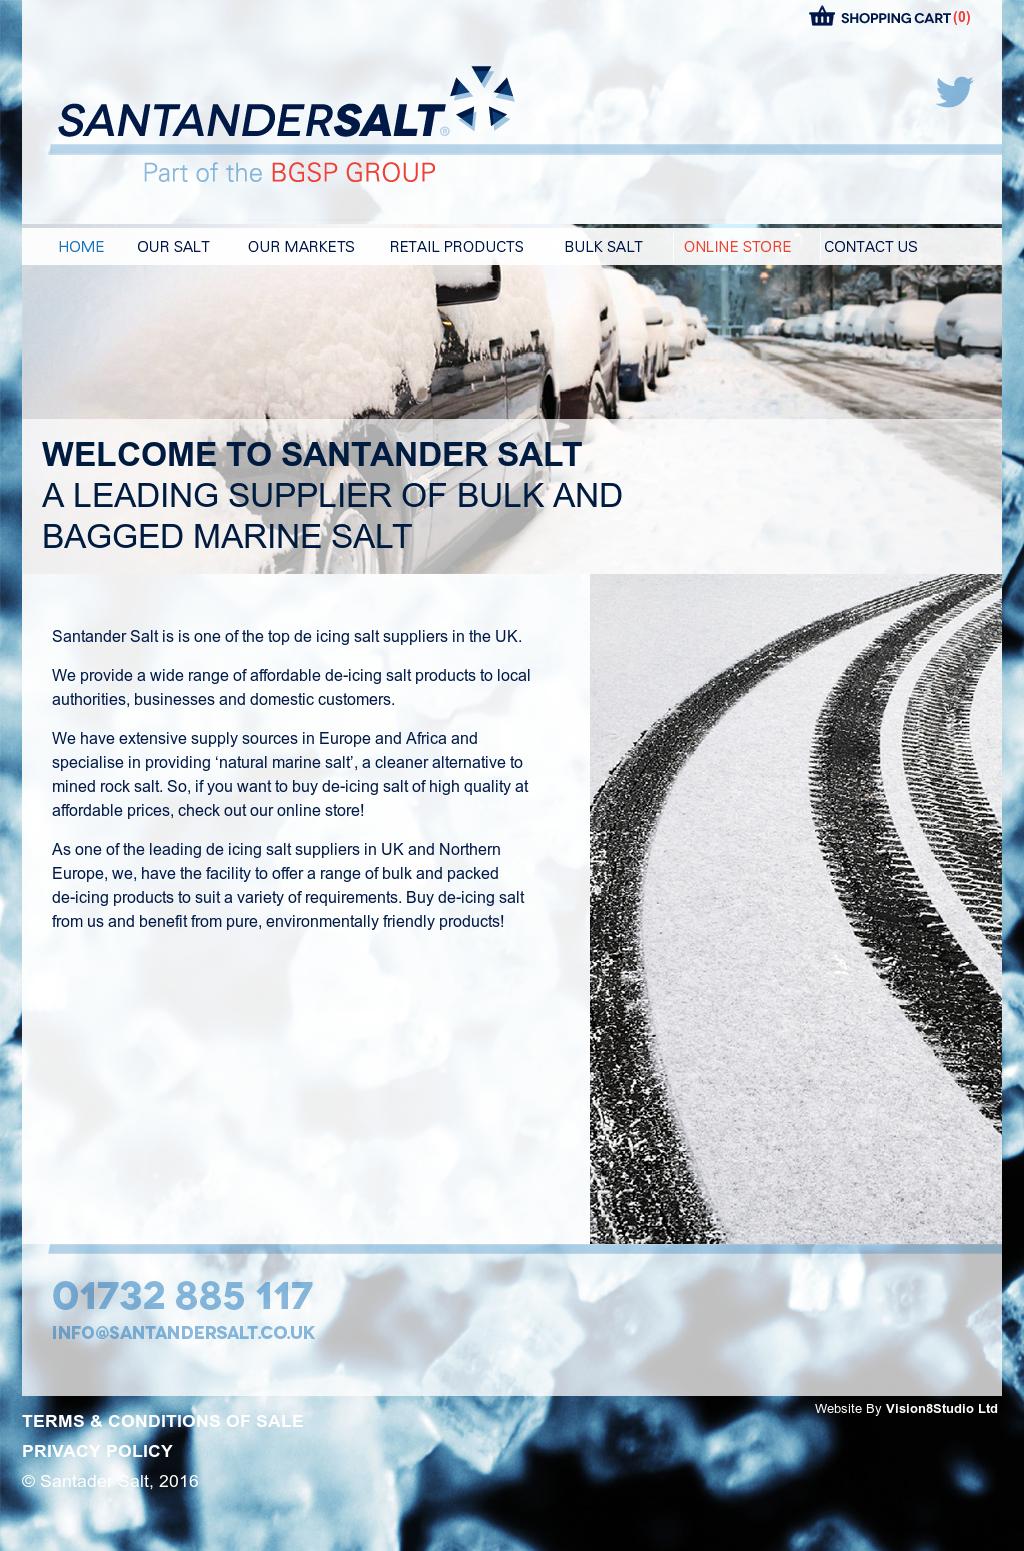 Santander Salt Competitors, Revenue and Employees - Owler Company